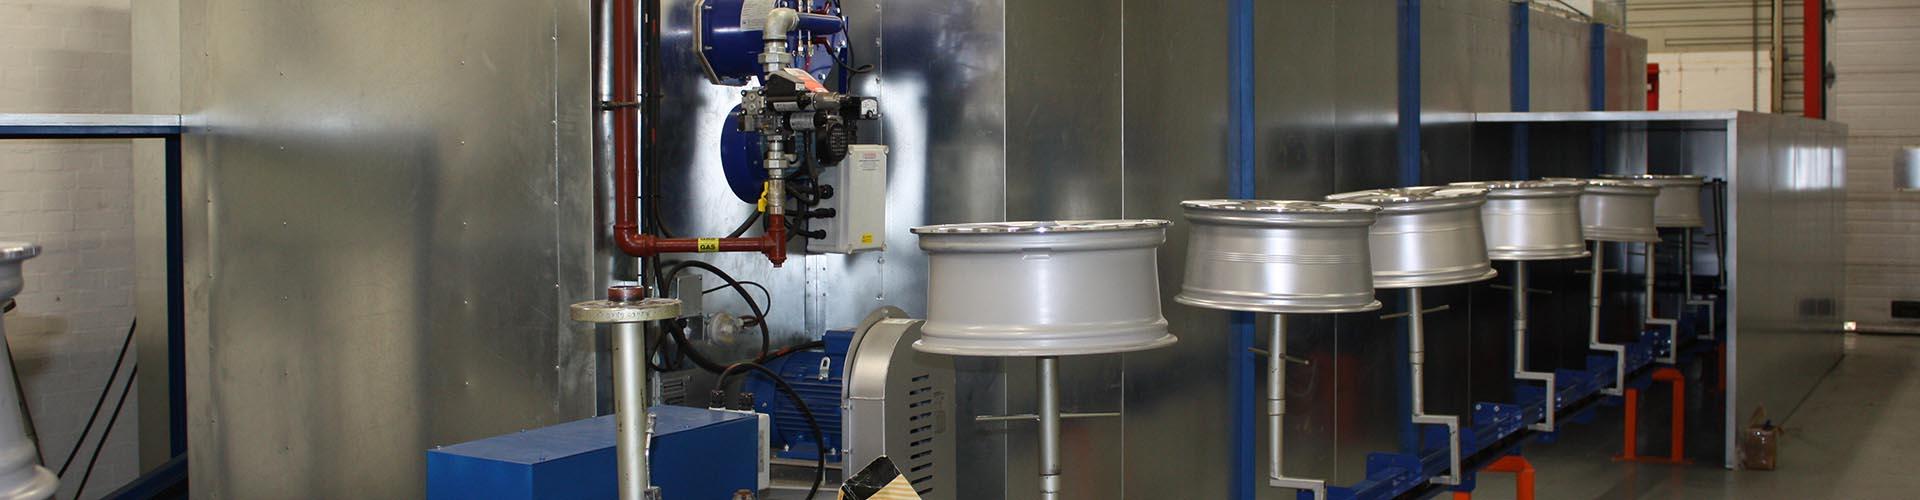 BKR Plant - Powder Coating Equipment Specialists